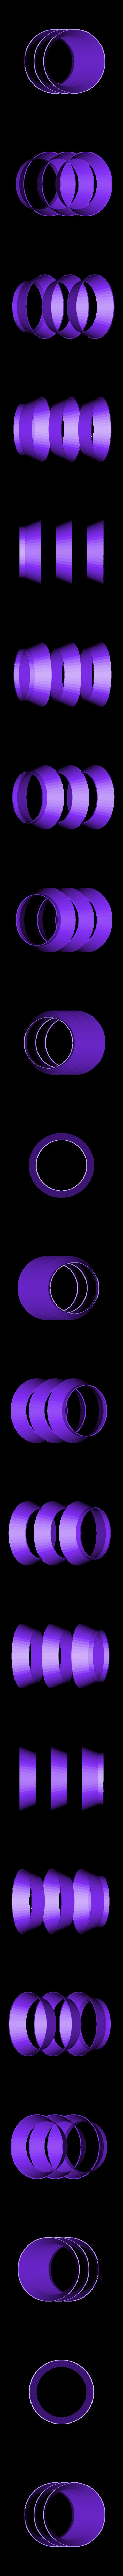 Koselig_Part_2.stl Download free STL file Koselig • 3D printable object, MosaicManufacturing